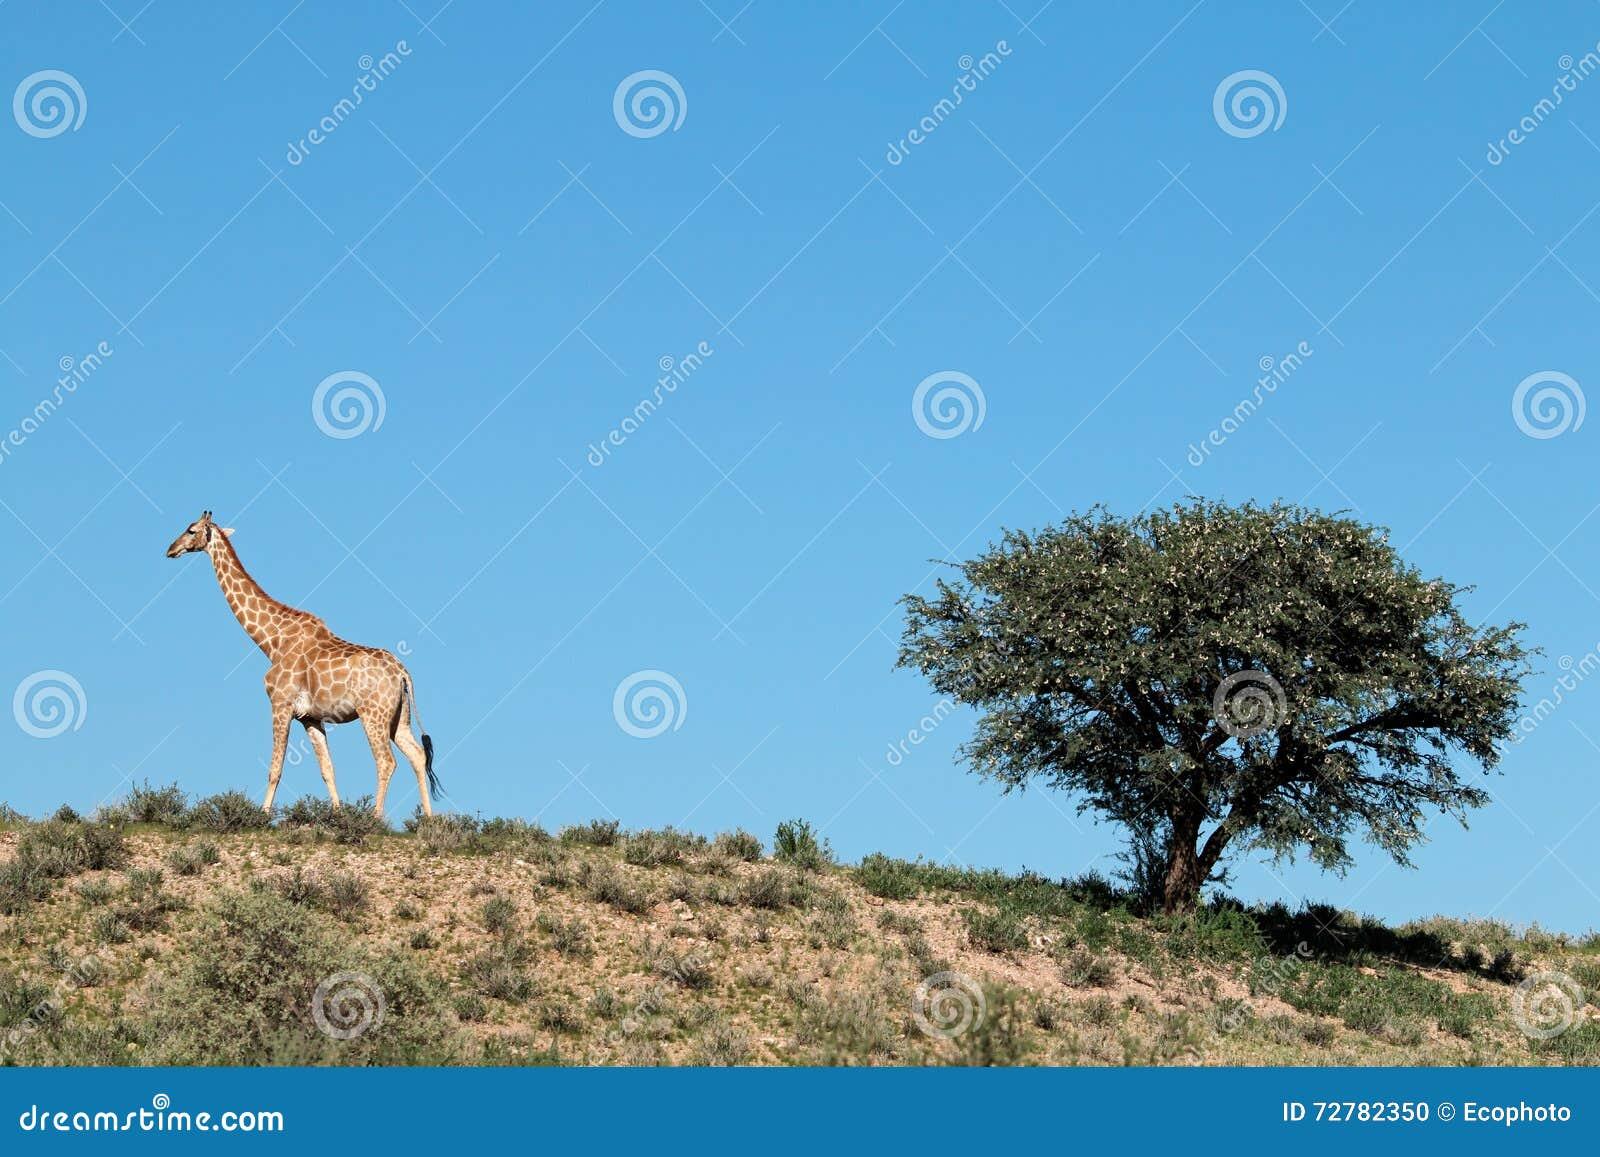 Giraffe and thorn tree